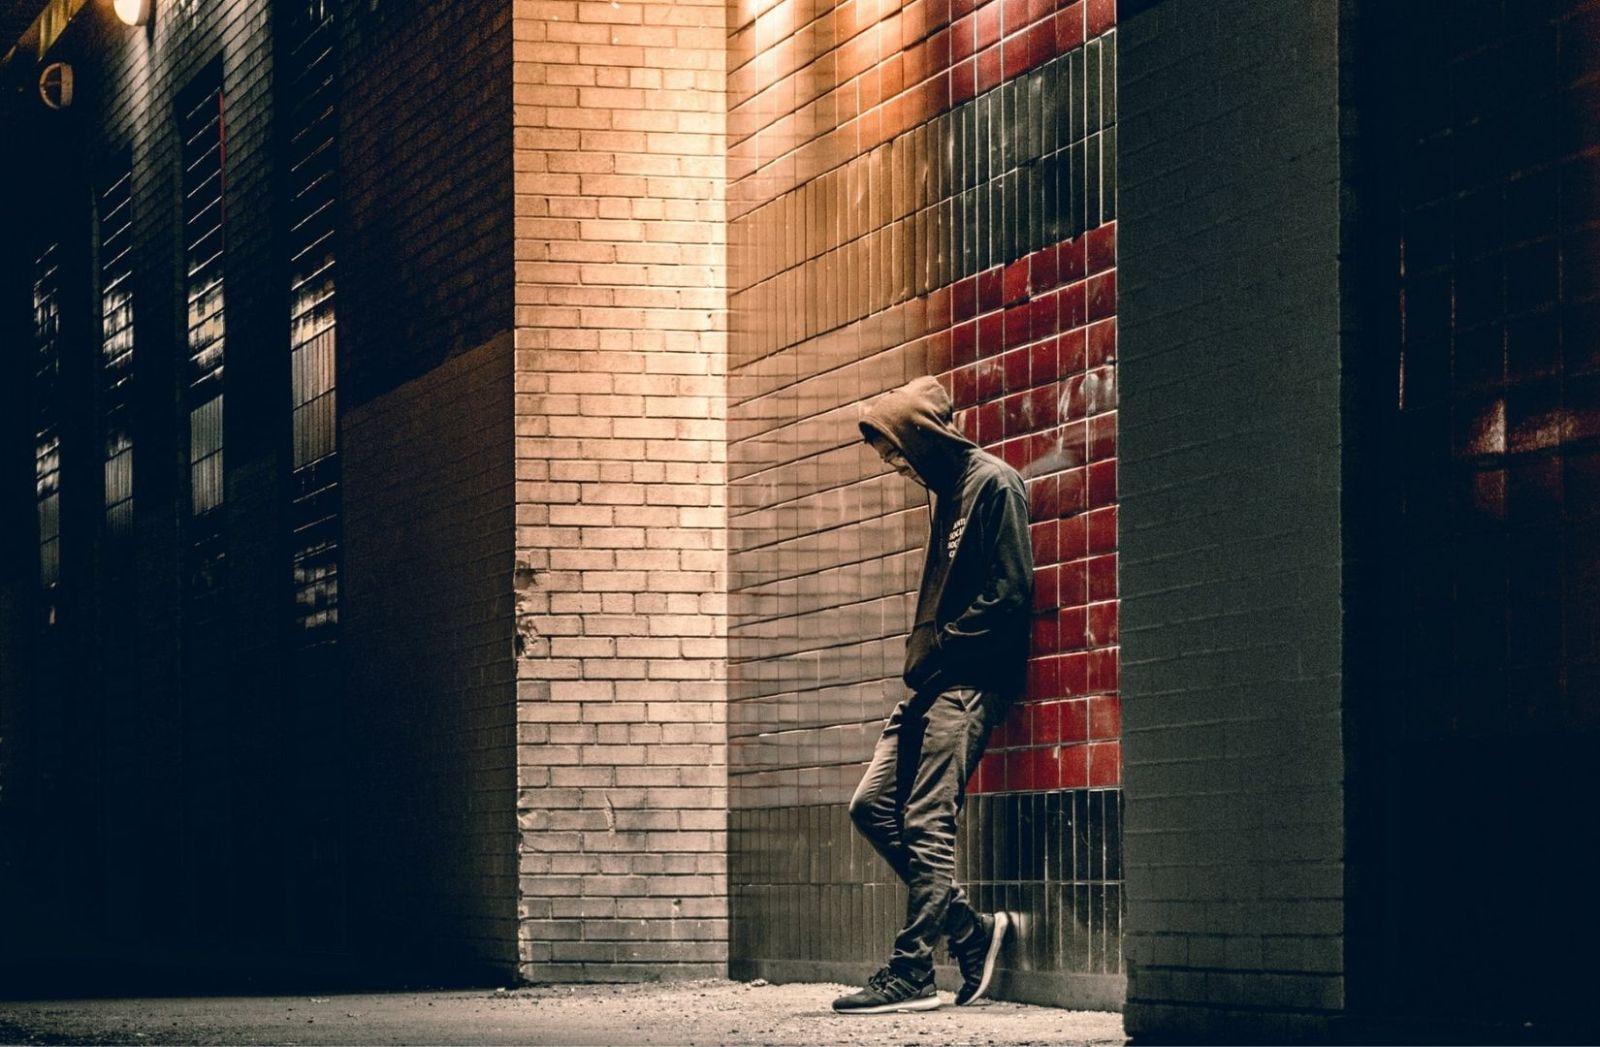 Notbeleuchtung in der Spadina Avenue, Toronto, Canada. (Foto Warren Wong, Unsplash.com)